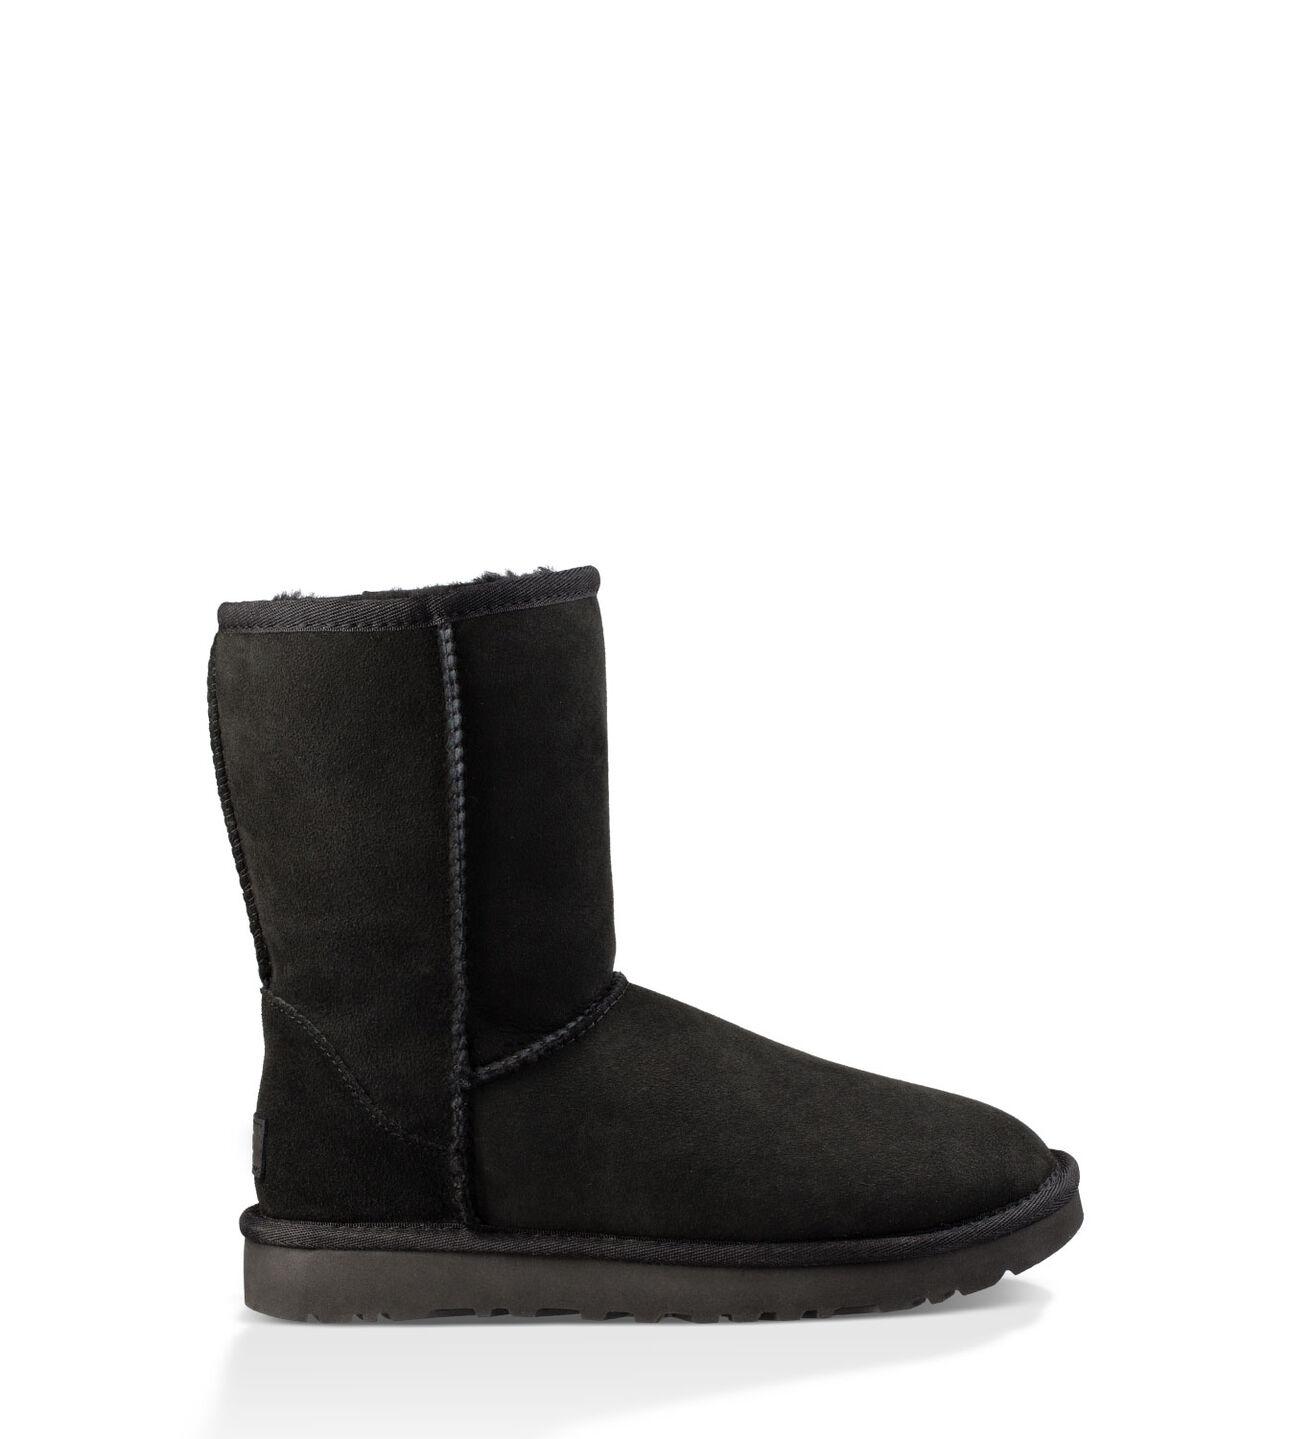 Ugg Classic Sheepskin Boots Ugg Official